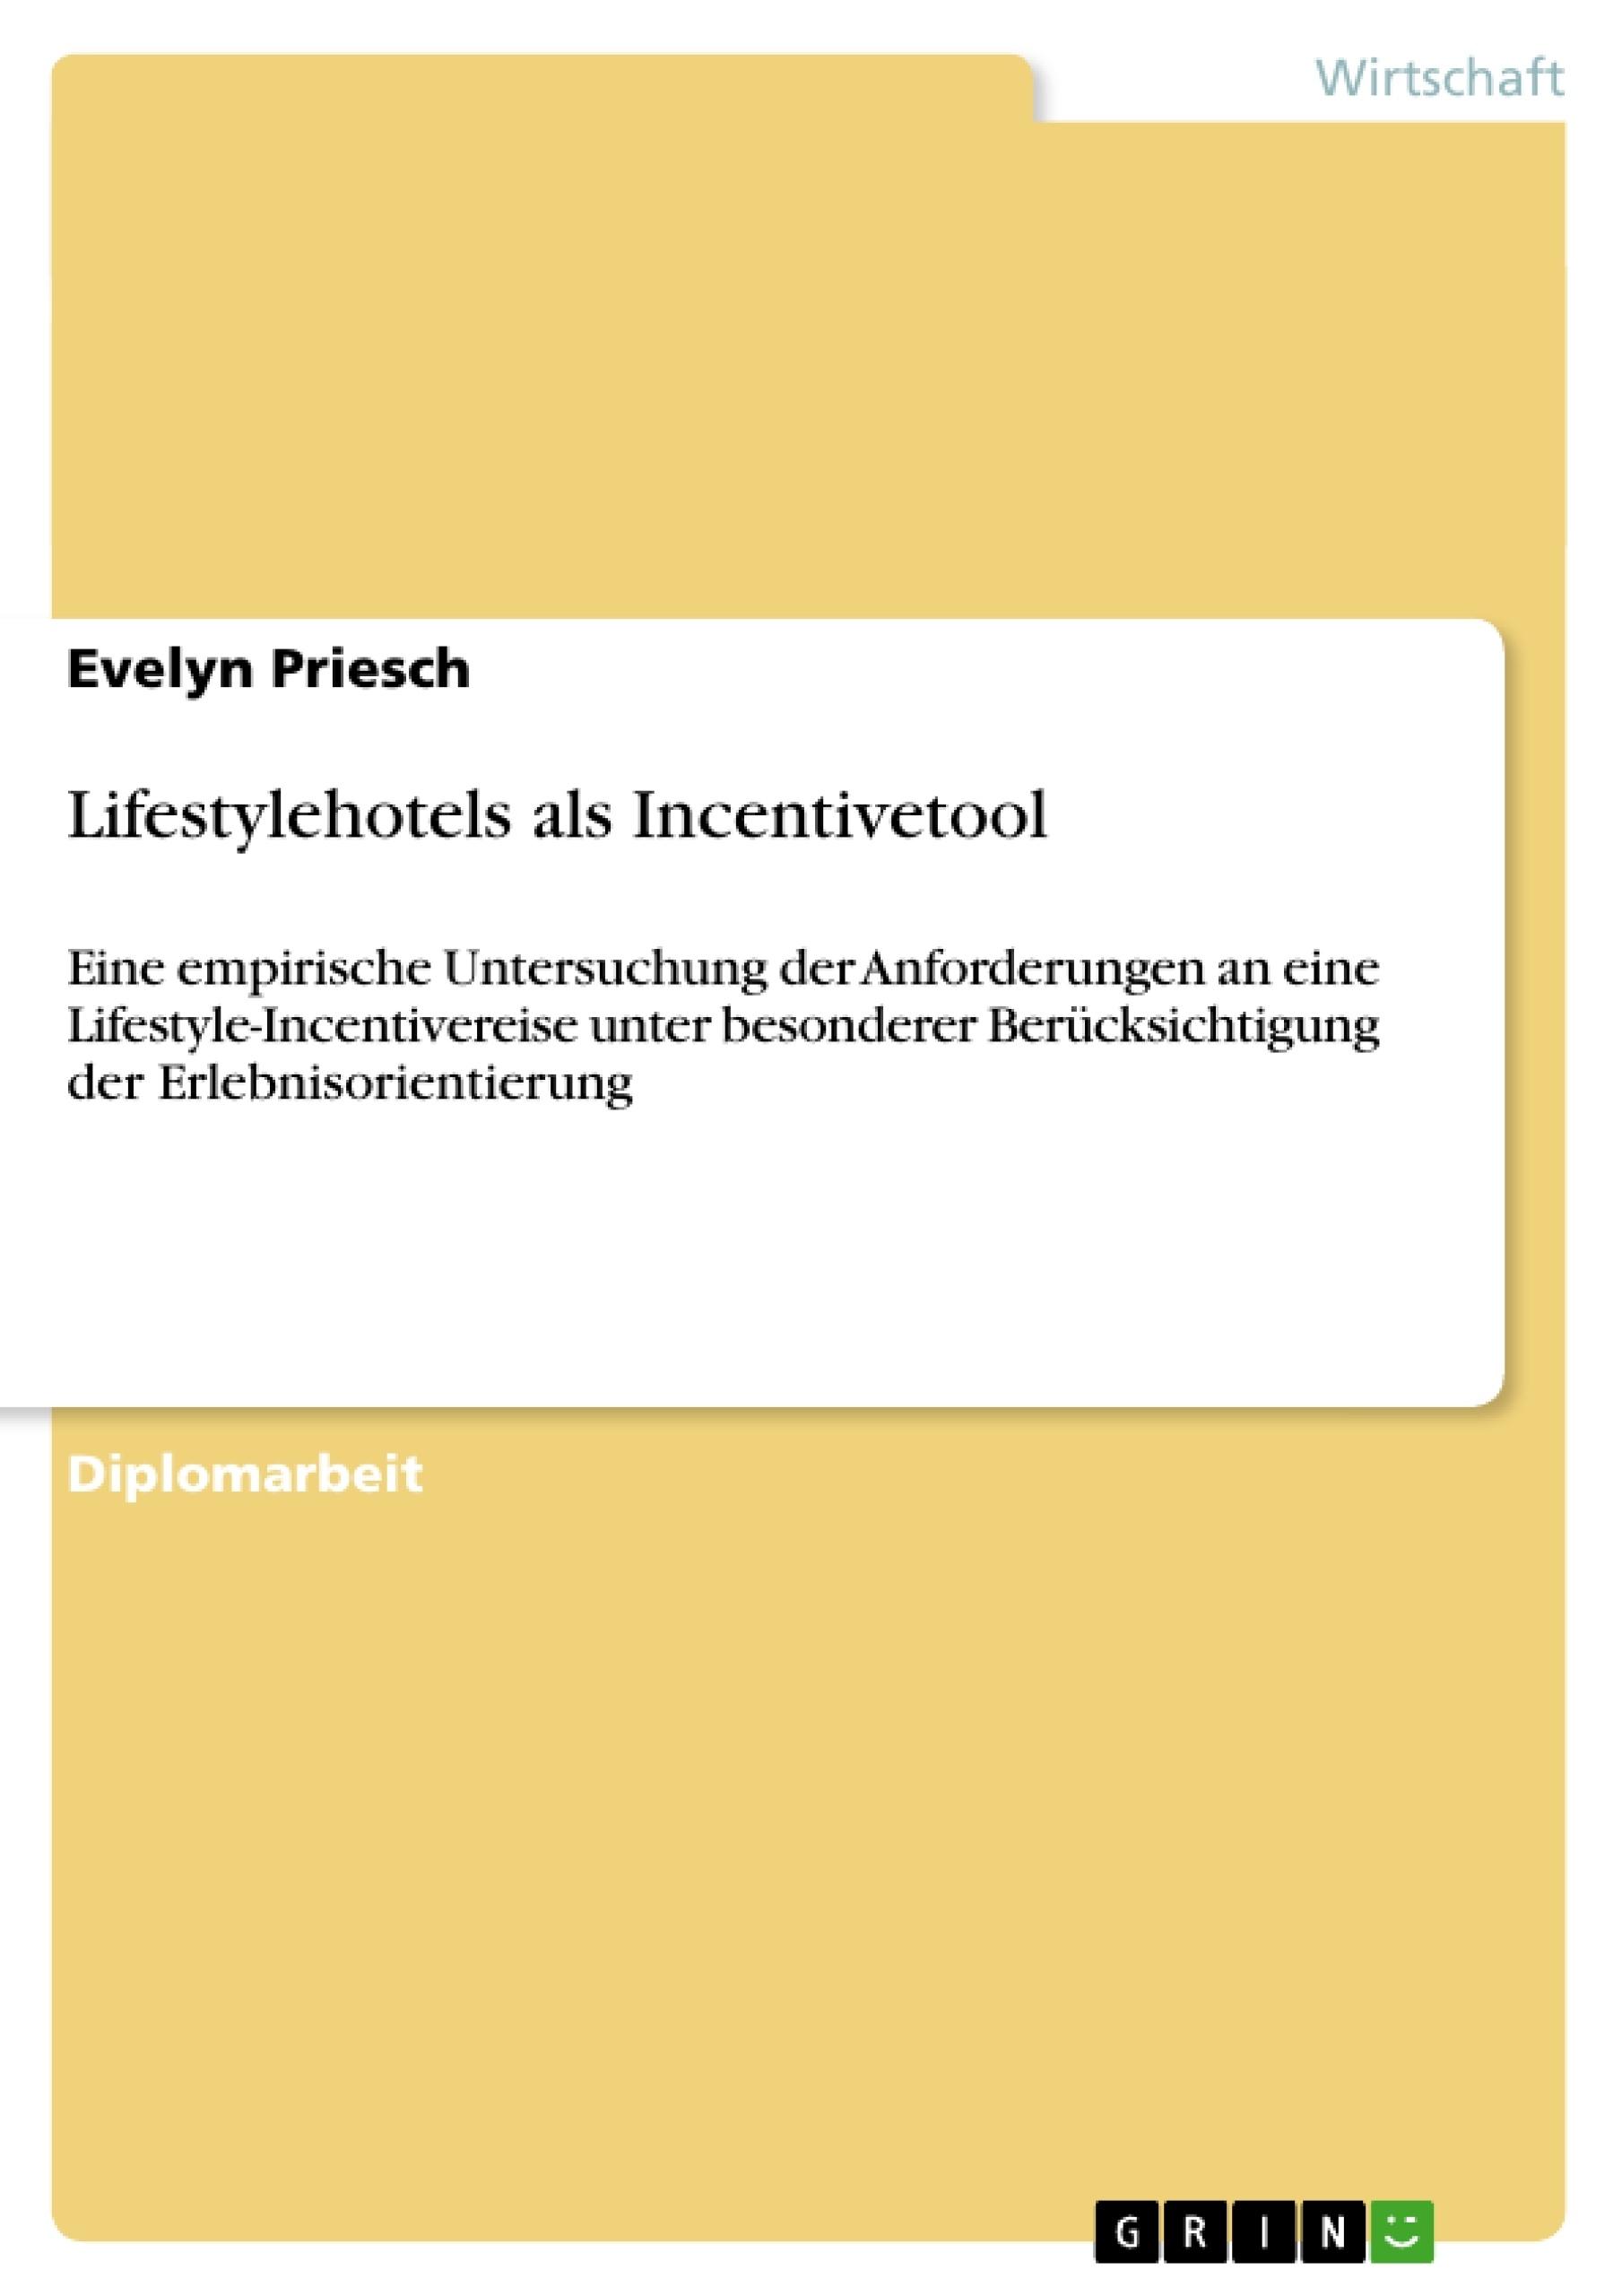 Titel: Lifestylehotels als Incentivetool